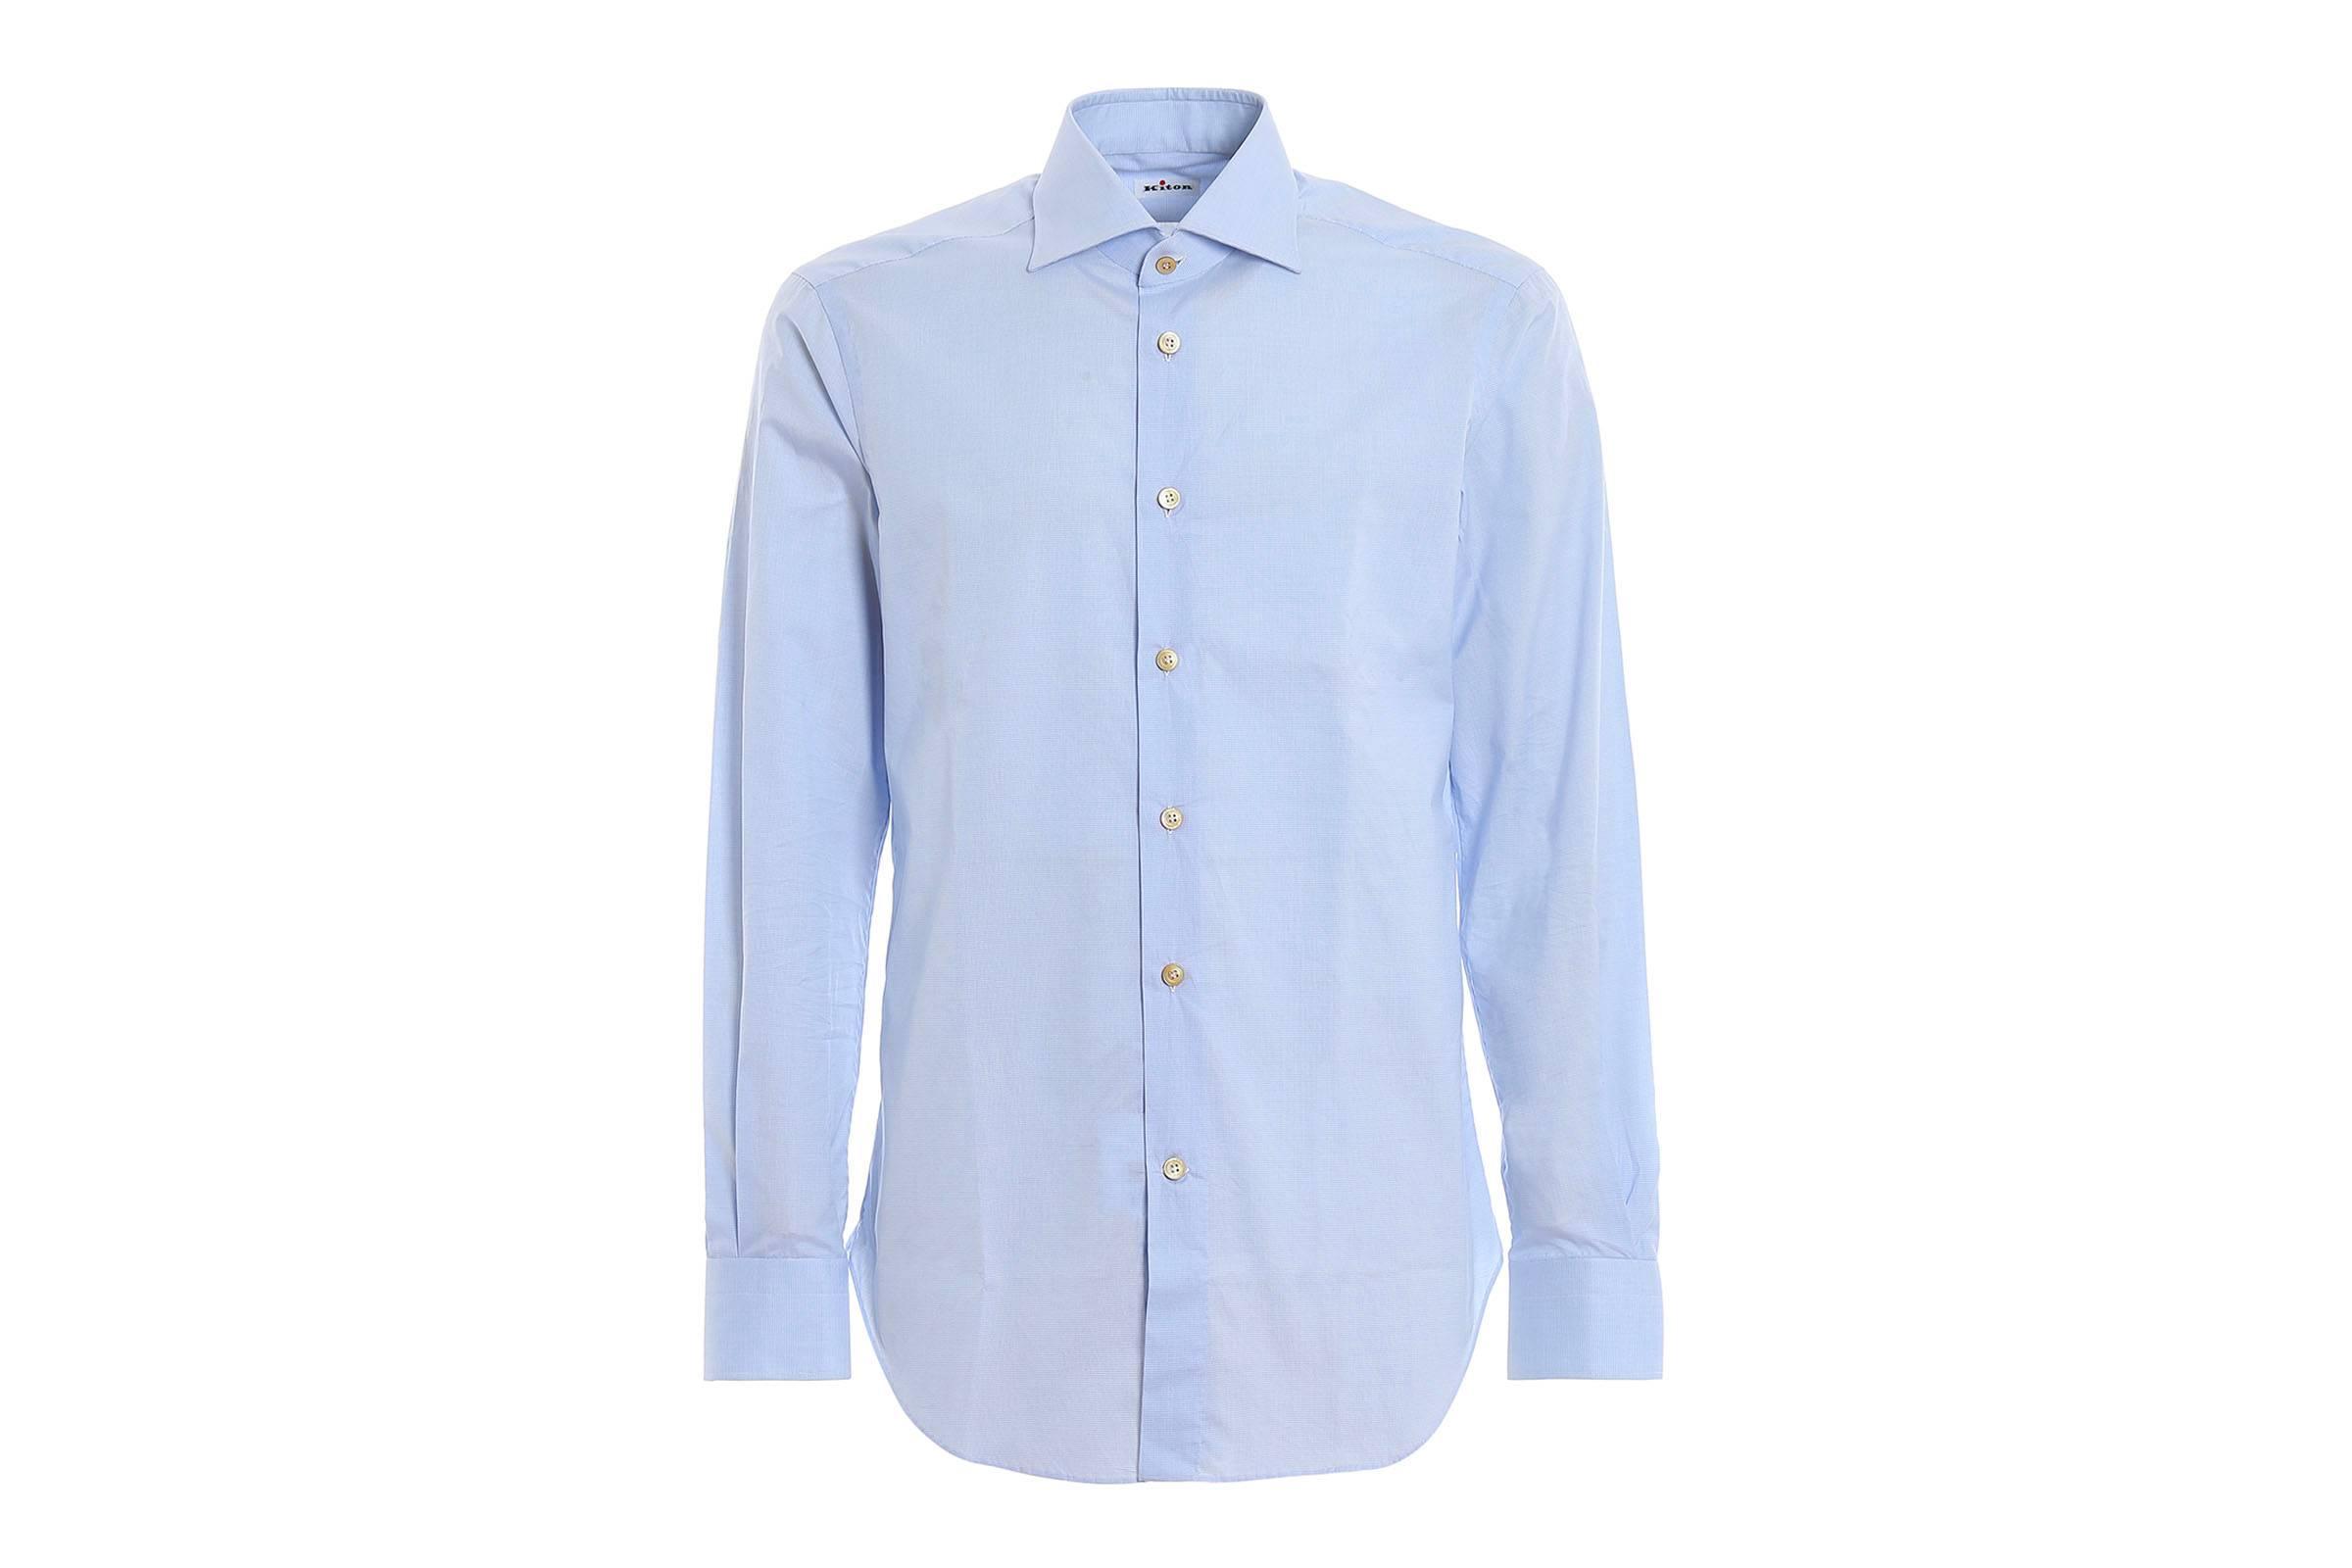 Kiton Spread Collar Shirt